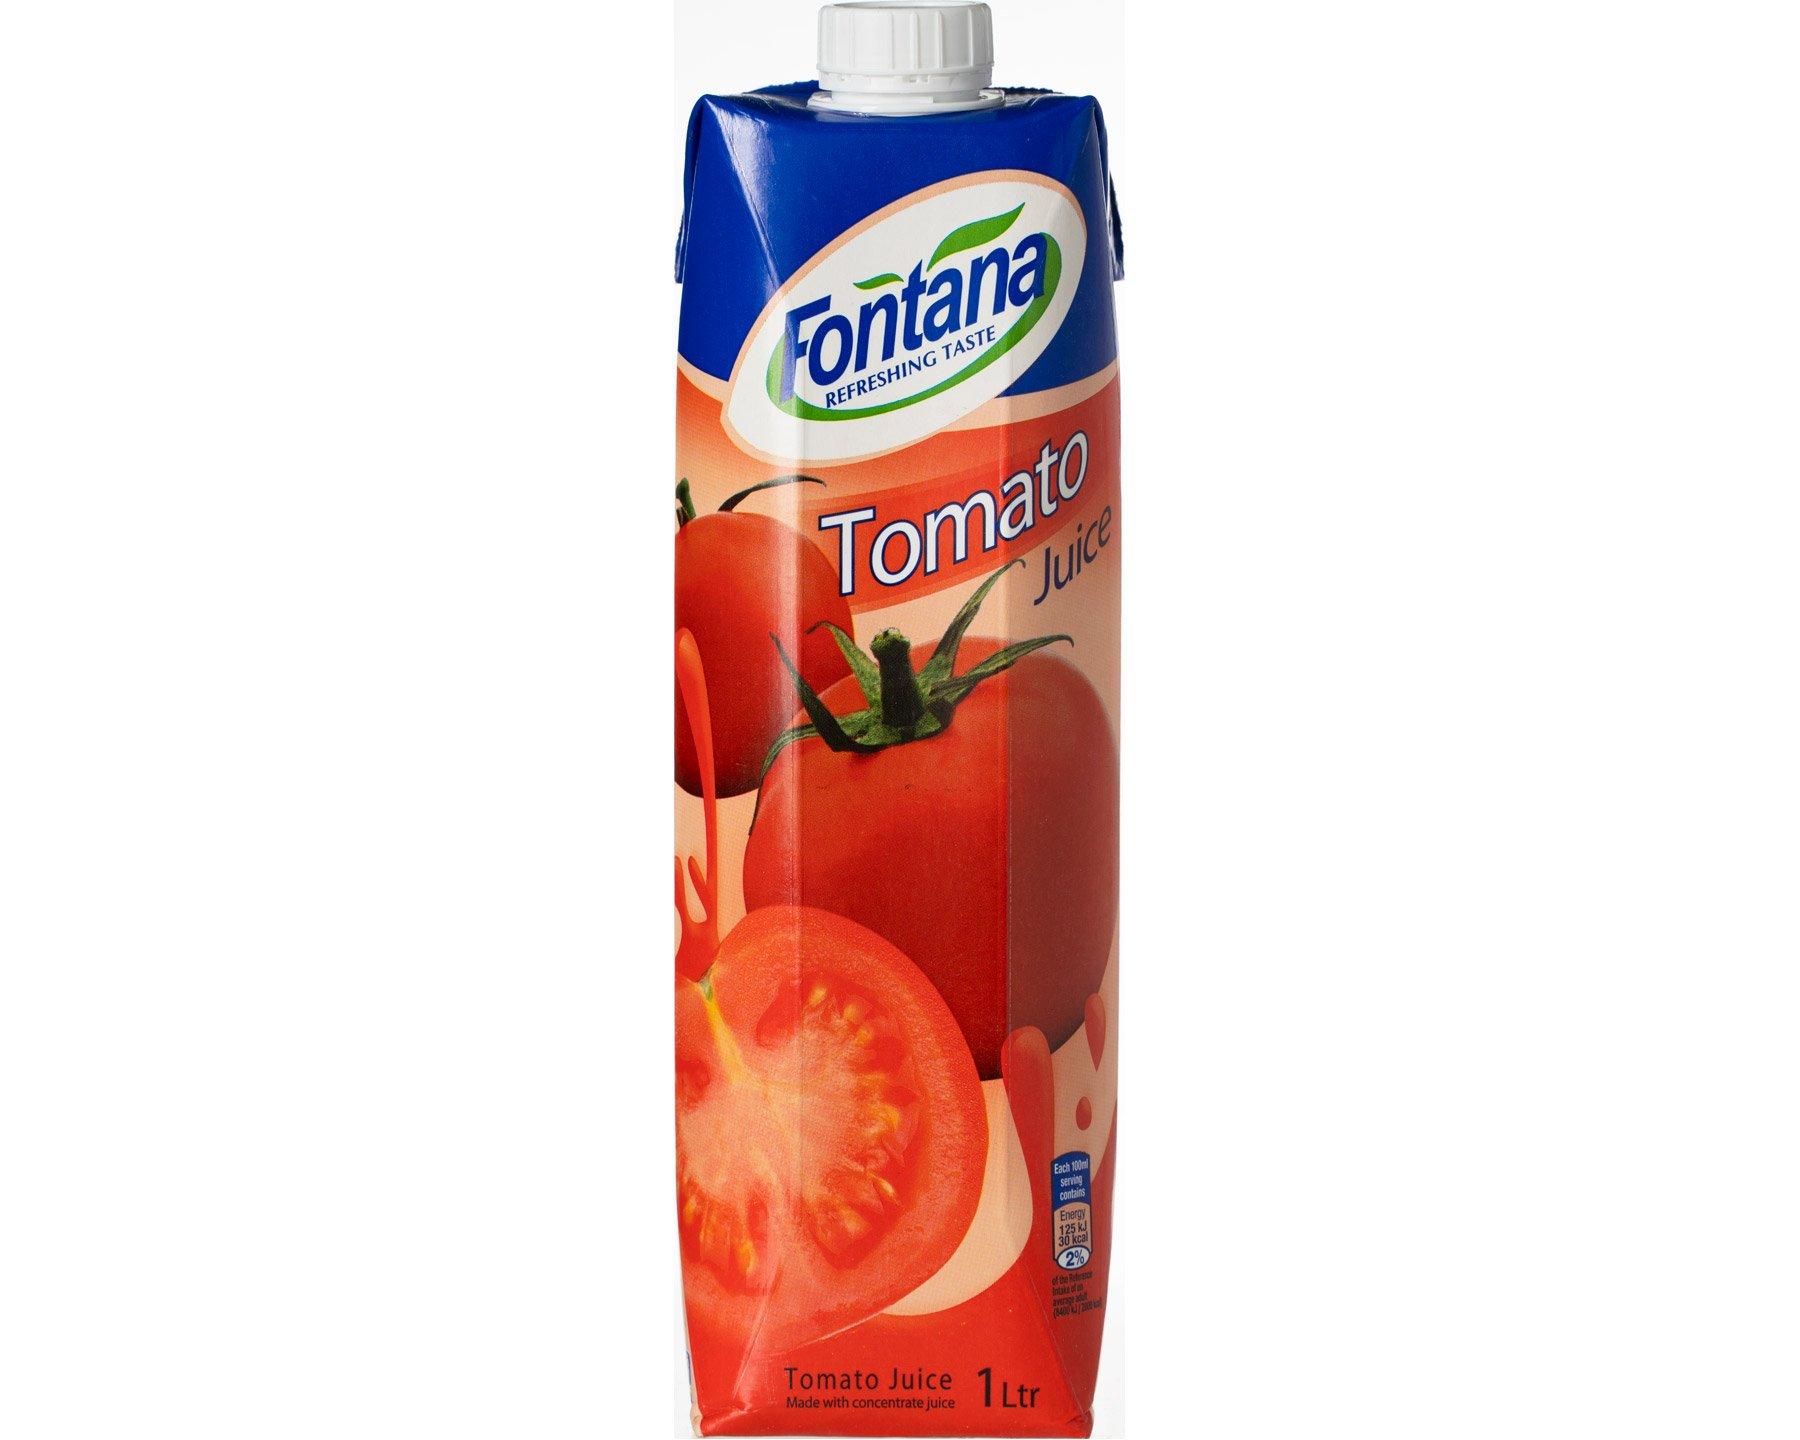 Fontana Tomatjuice 1 l